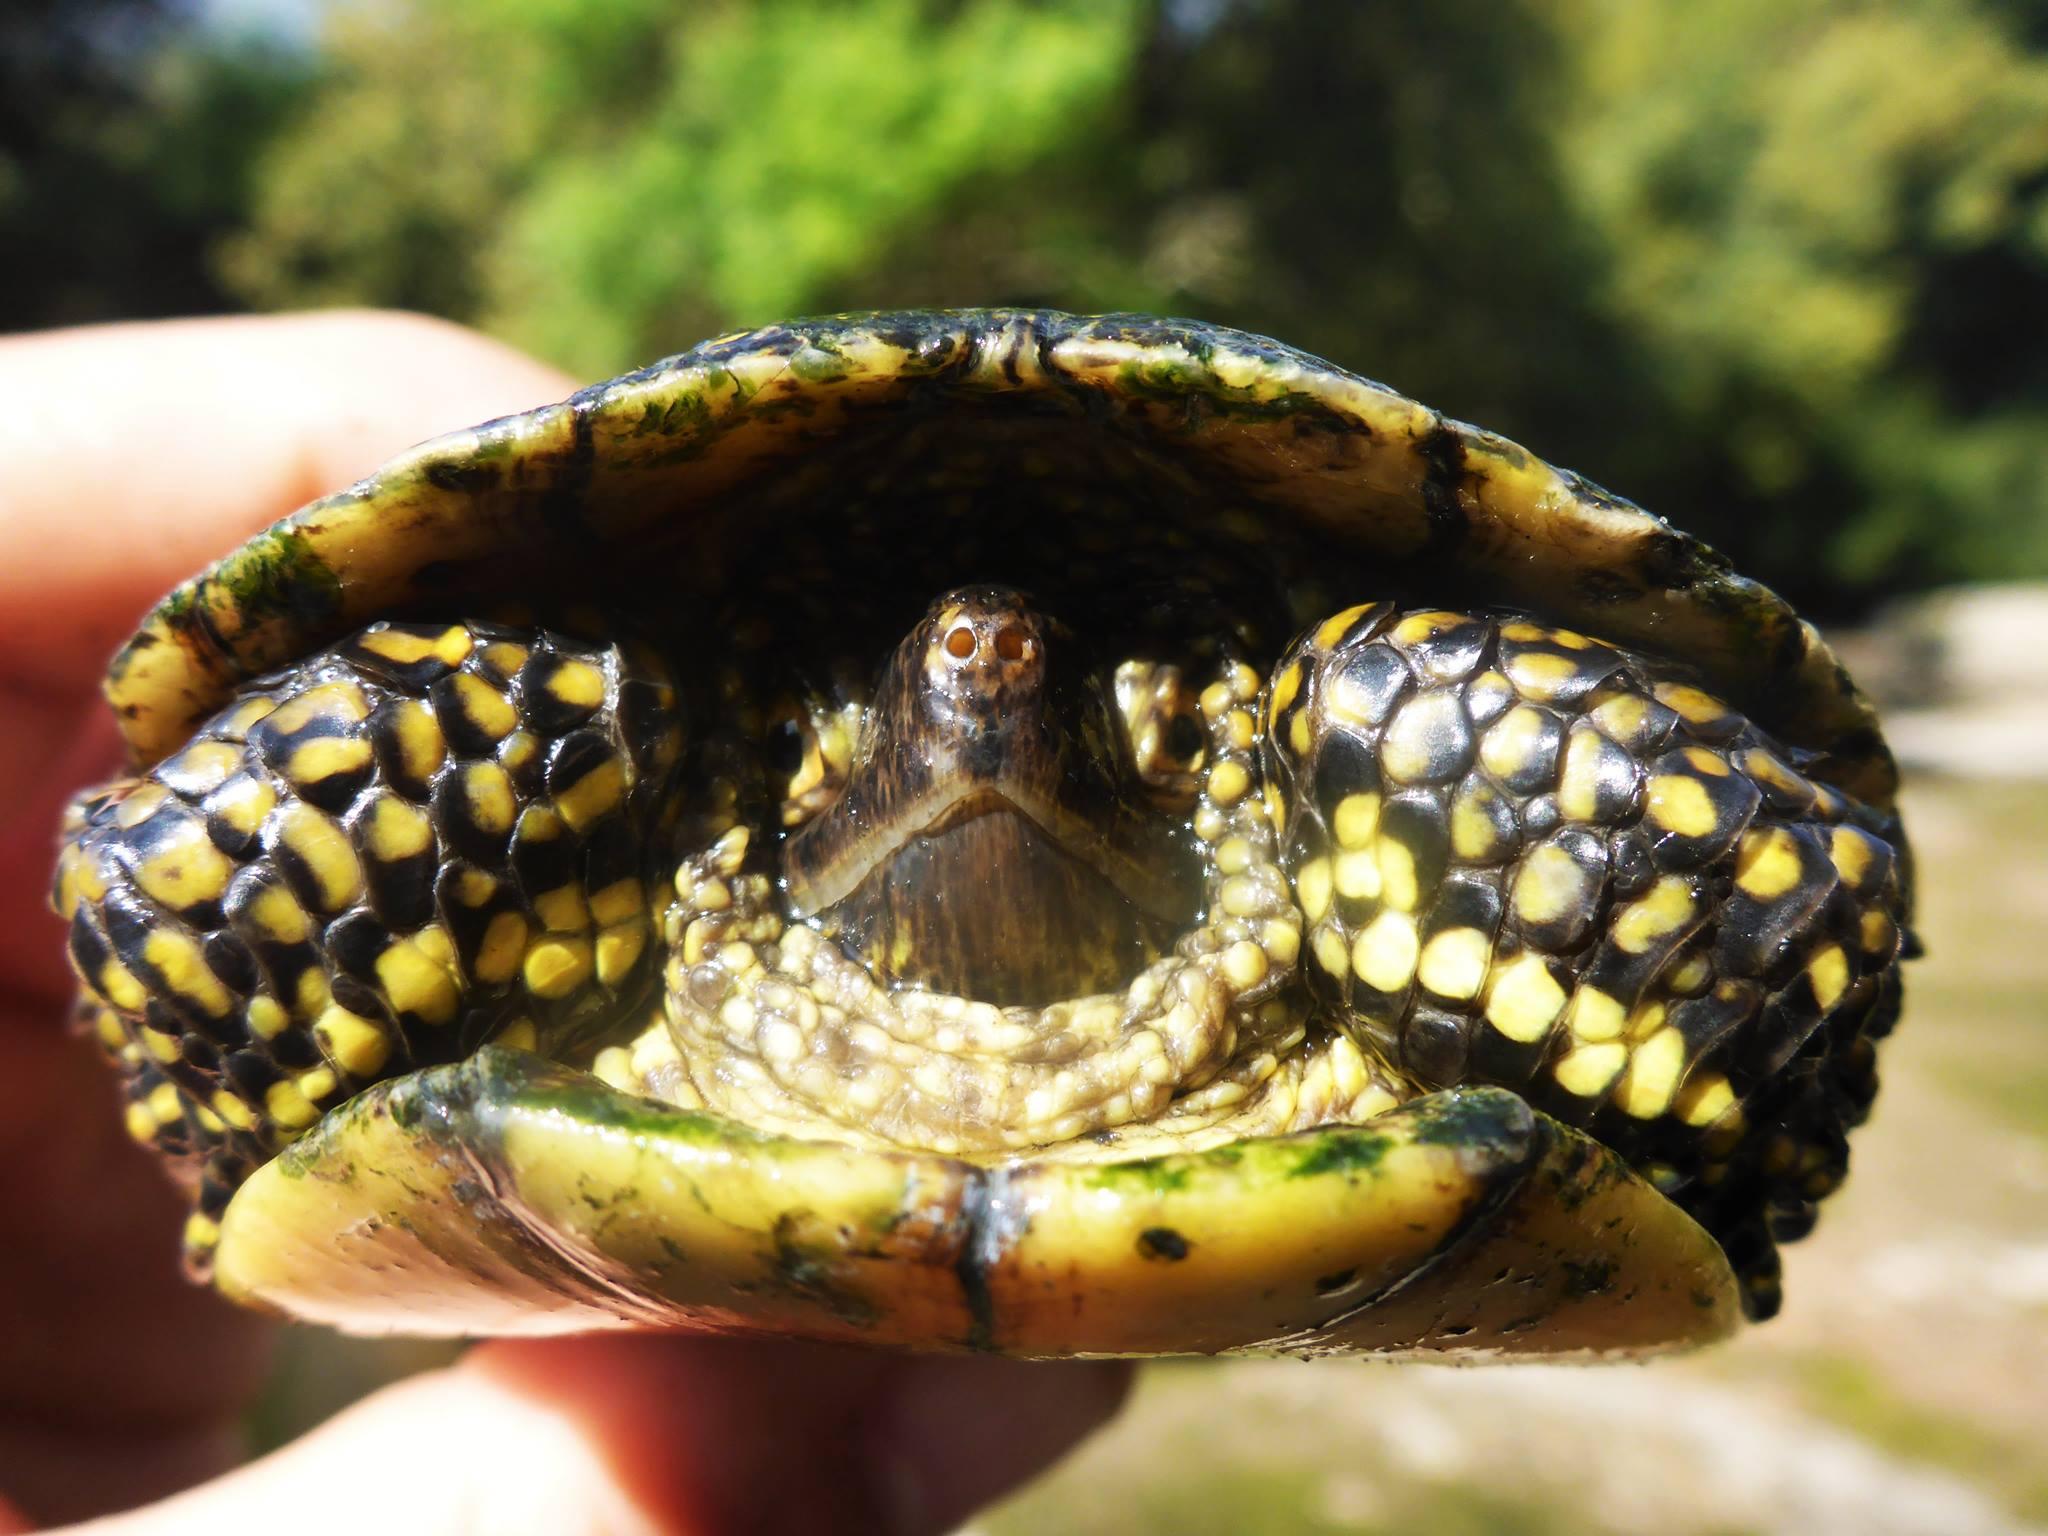 Pleins de jolies tortues dans les environs.